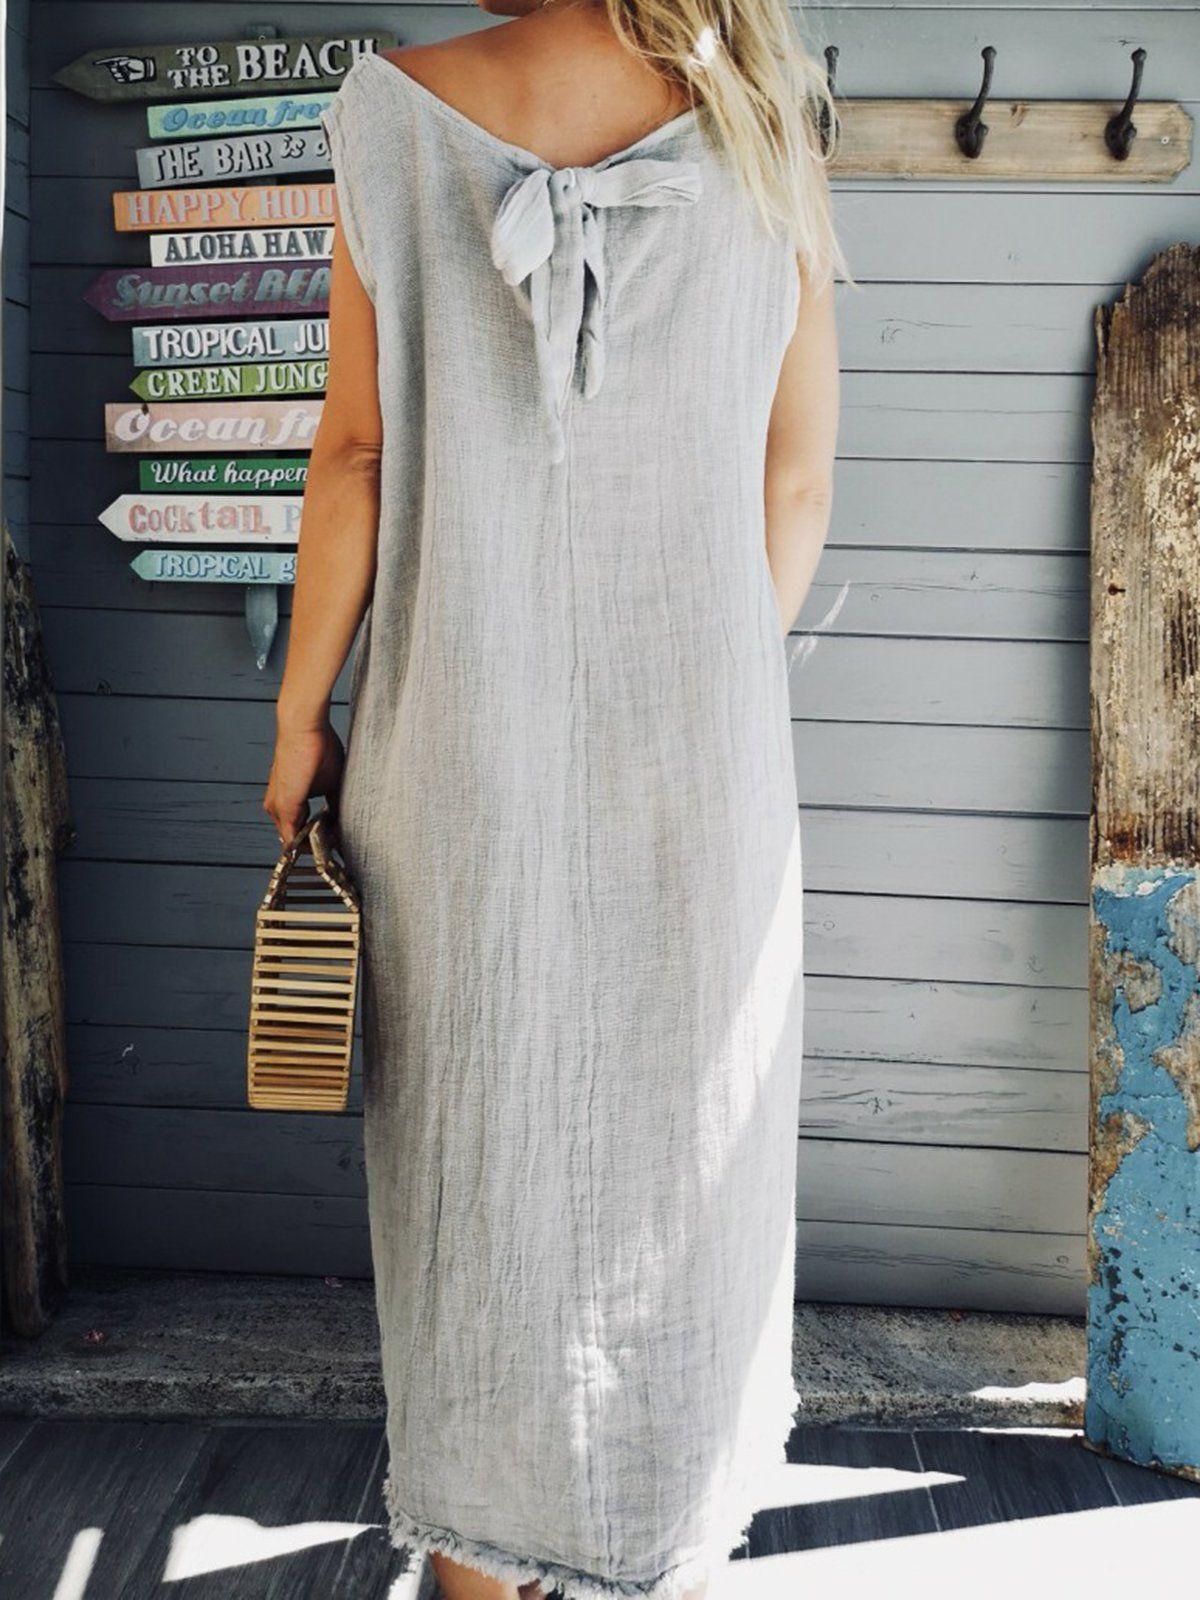 a2c6bd0cf2bdd Buy Shirt Dress Summer Dresses For Women at zoesweet. Online Shopping  zoesweet Summer Dresses 1